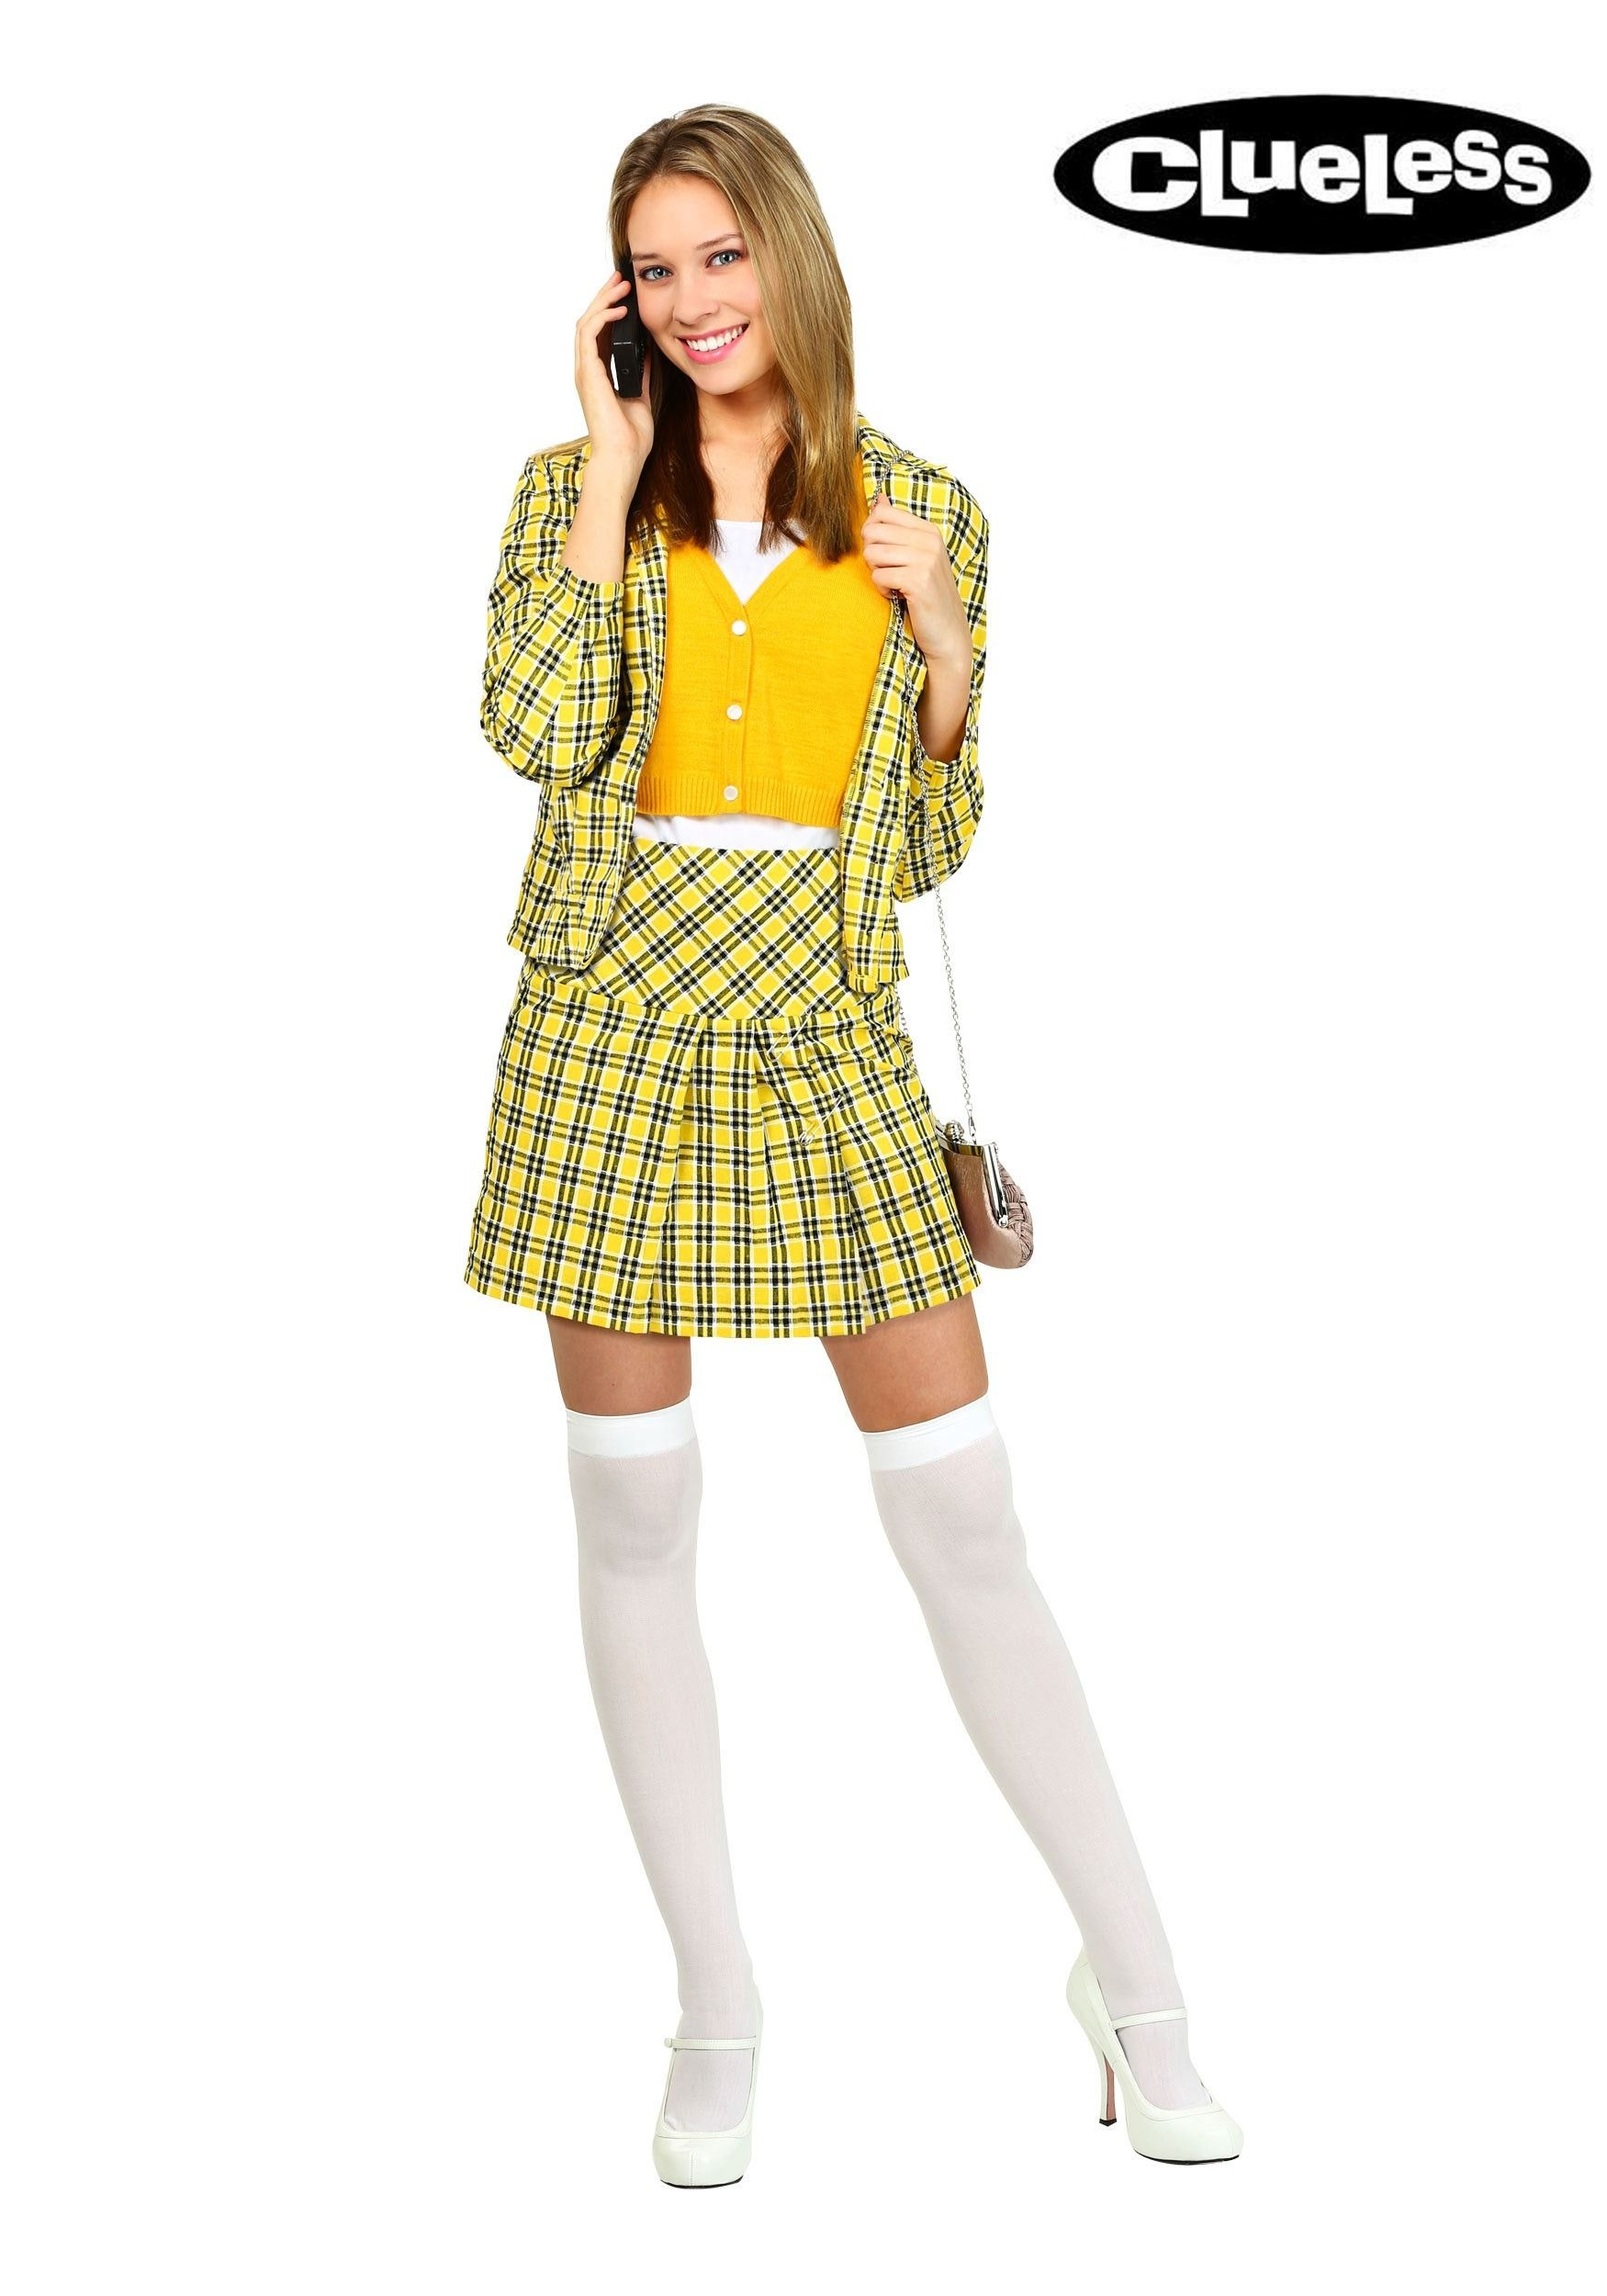 Wheres Waldo Wenda Kit – Spirit Halloween | Halloween ...  |Waldo 90s Halloween Costumes For Women